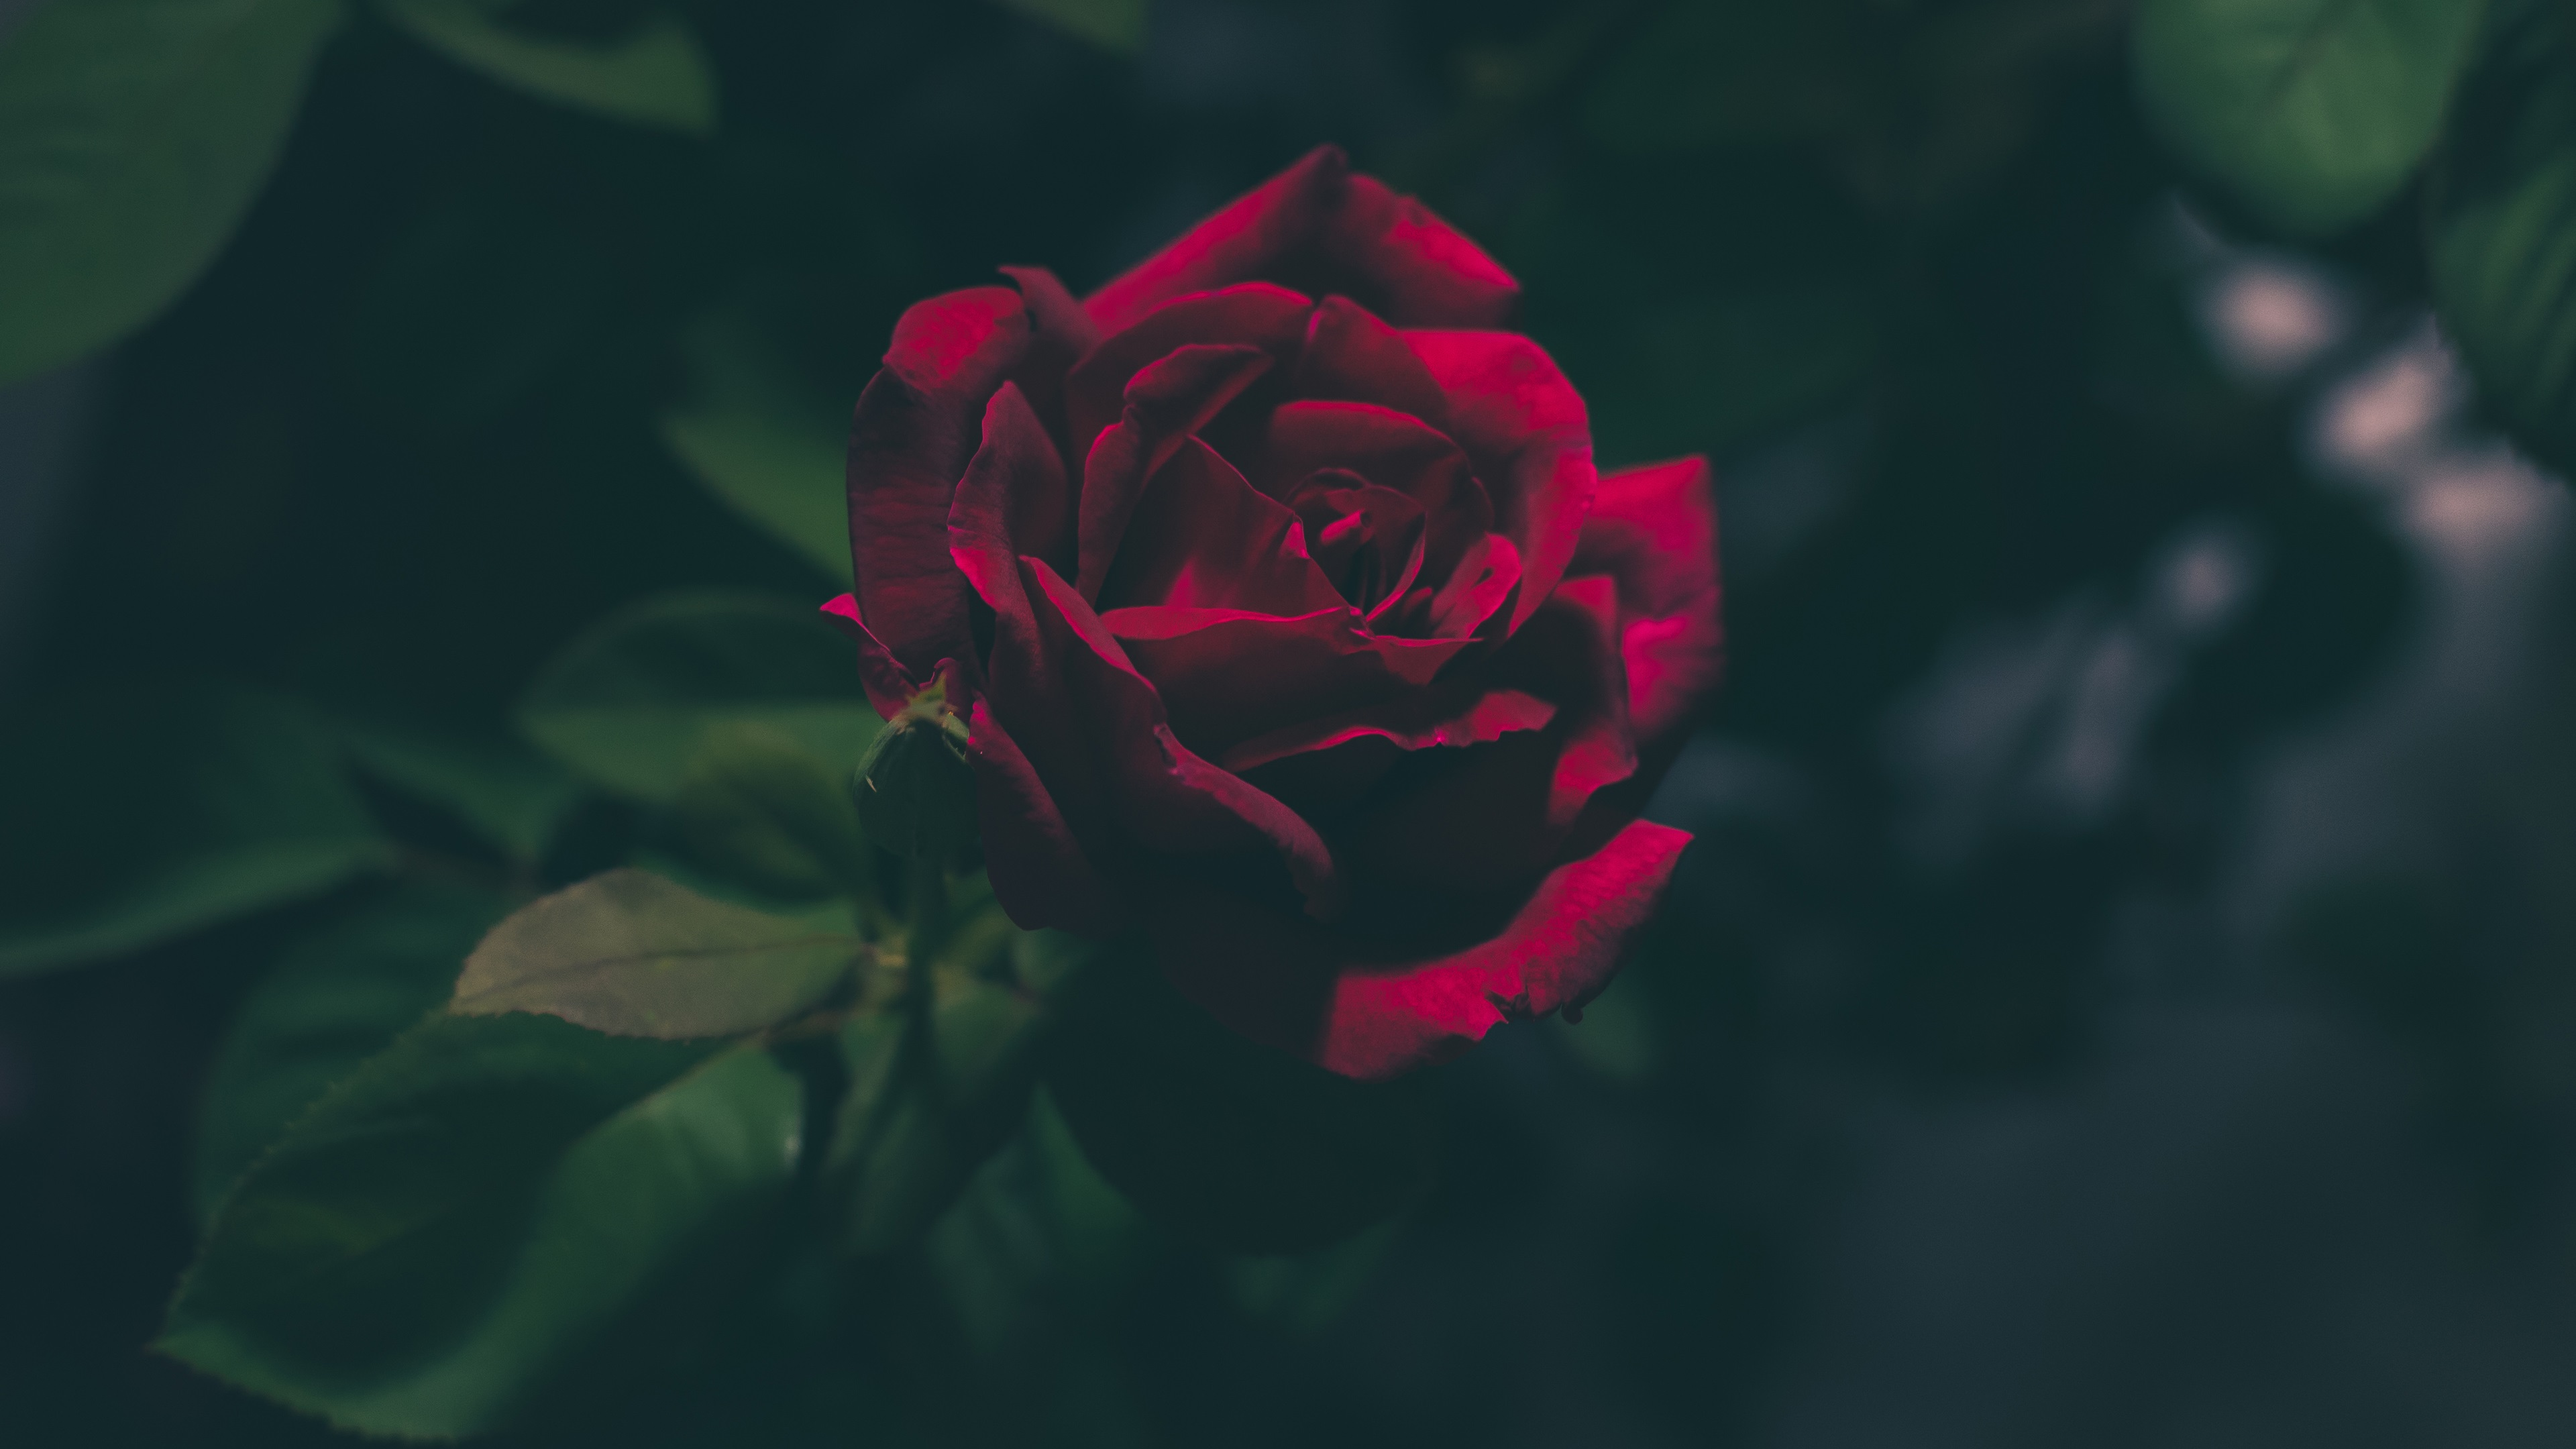 Deep Red Rose 4k Ultra Fond d'écran HD   Arrière-Plan   3840x2160   ID:821317 - Wallpaper Abyss